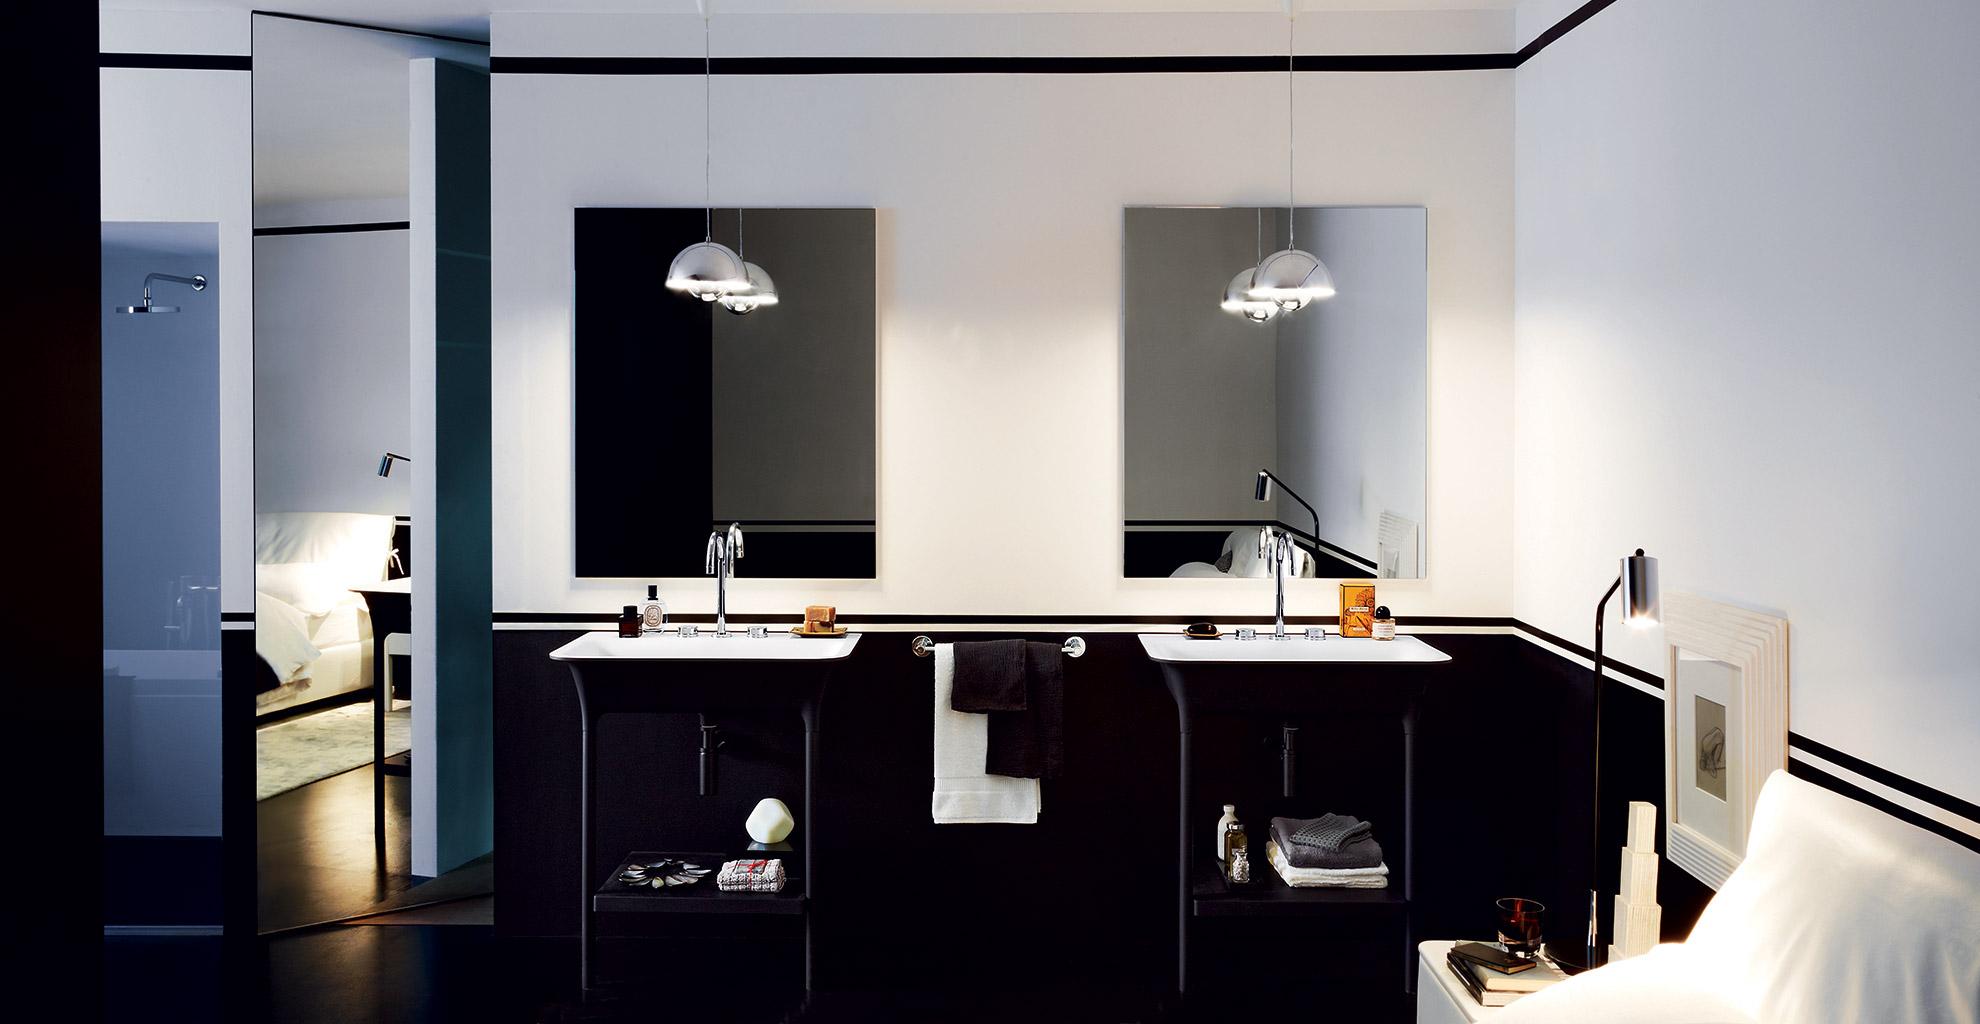 Zucchetti Bathroom Faucets morphing | zucchettikos